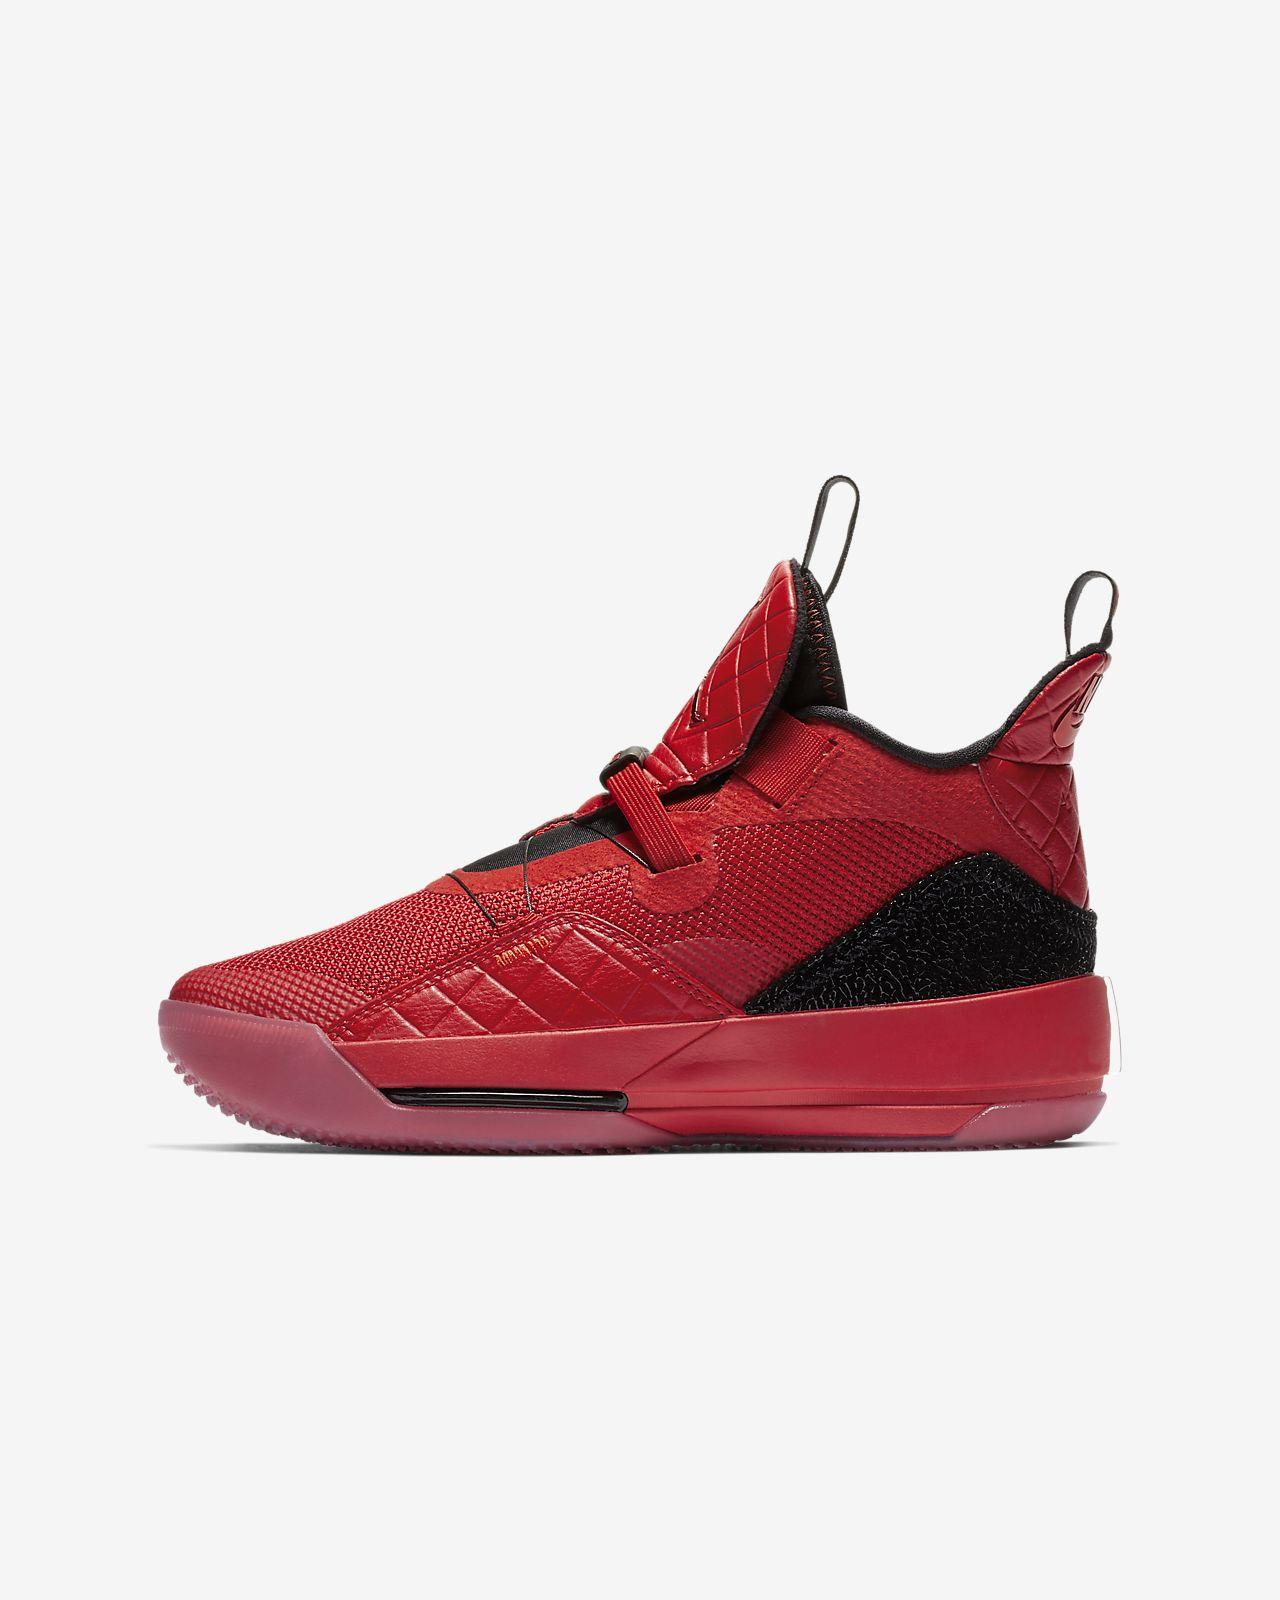 15f128fc5 Air Jordan XXXIII Zapatillas de baloncesto - Niño a. Nike.com ES